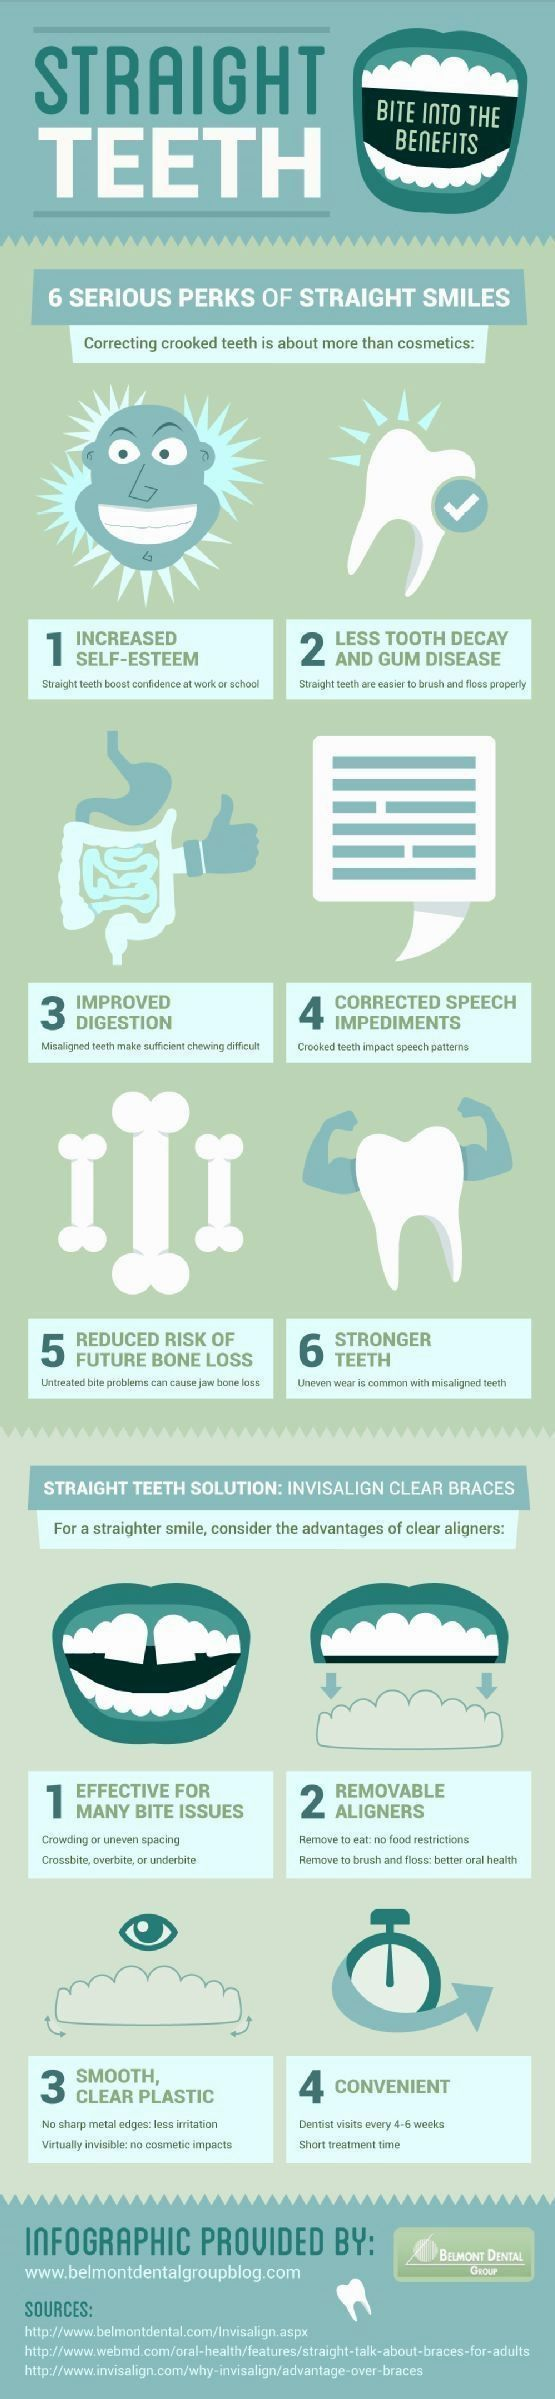 #dentalfacts #dentalfacts #dentalfacts #dentalfacts #dentalfacts #dentalfacts #dentalfacts #dentalfacts